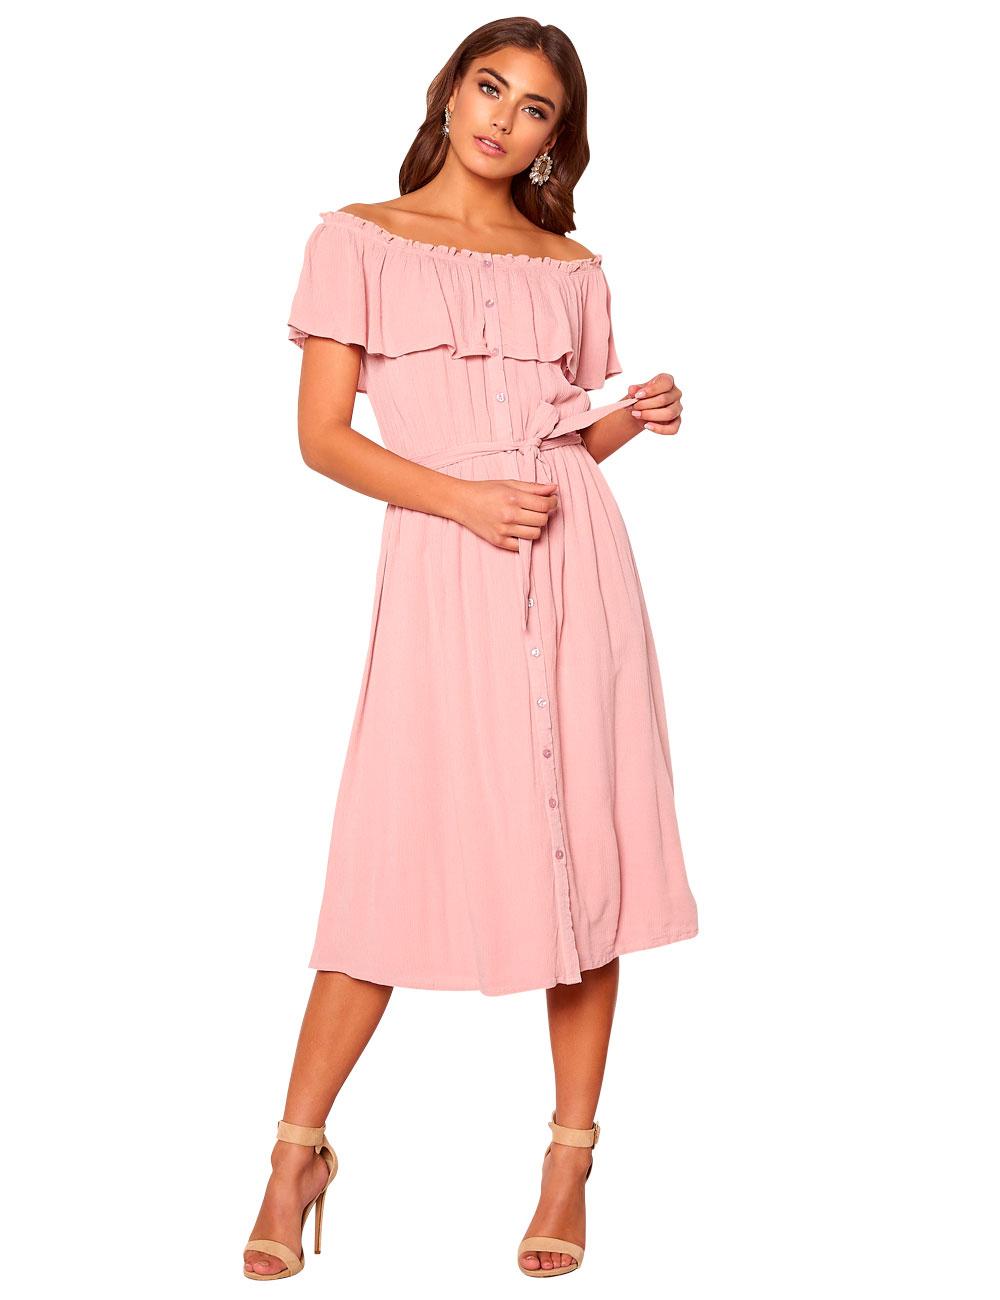 Kleid Make Way mit Carmen-Ausschnitt, blassrosa